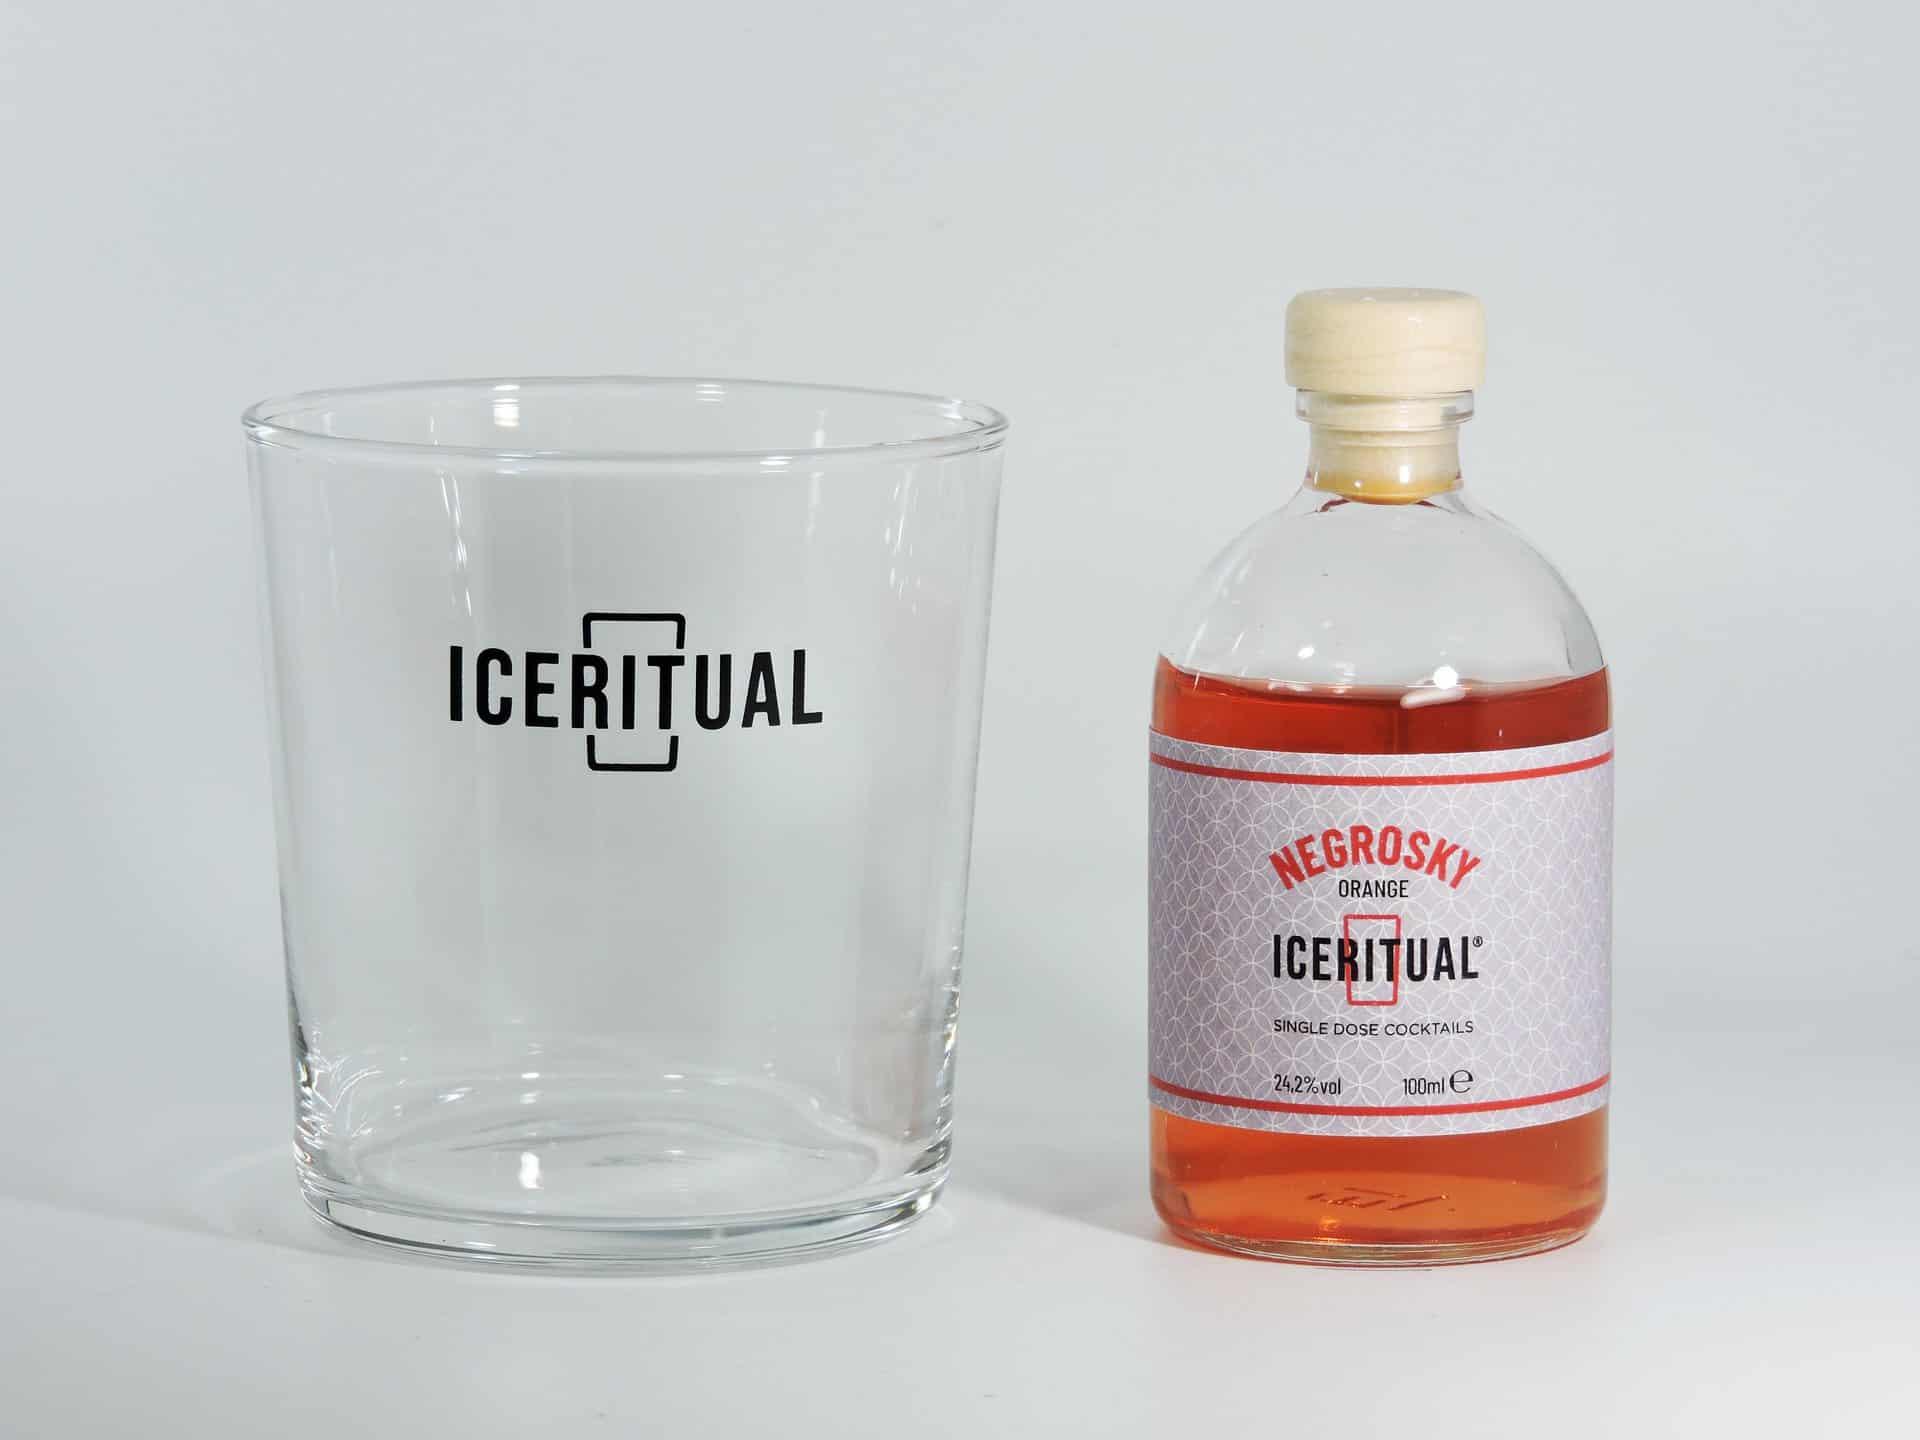 Bicchiere e Negrosky